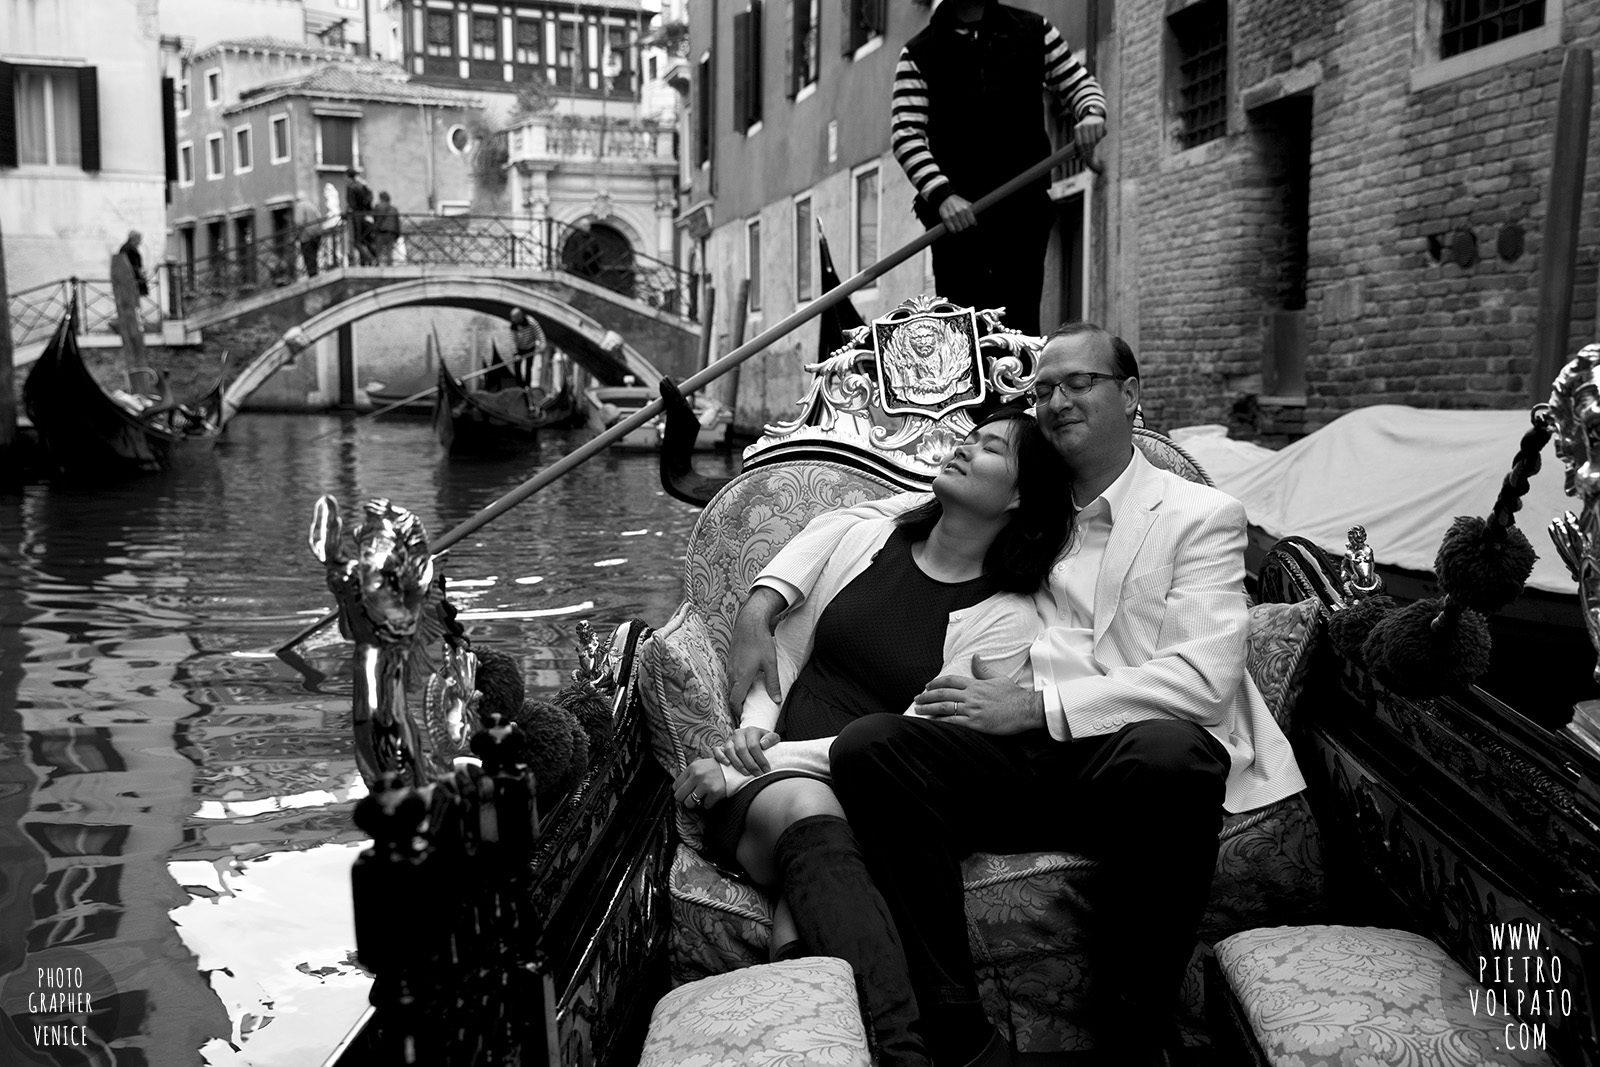 venice-honeymoon-photographer-photo-shoot-romantic-couple-vacation-20161019_02